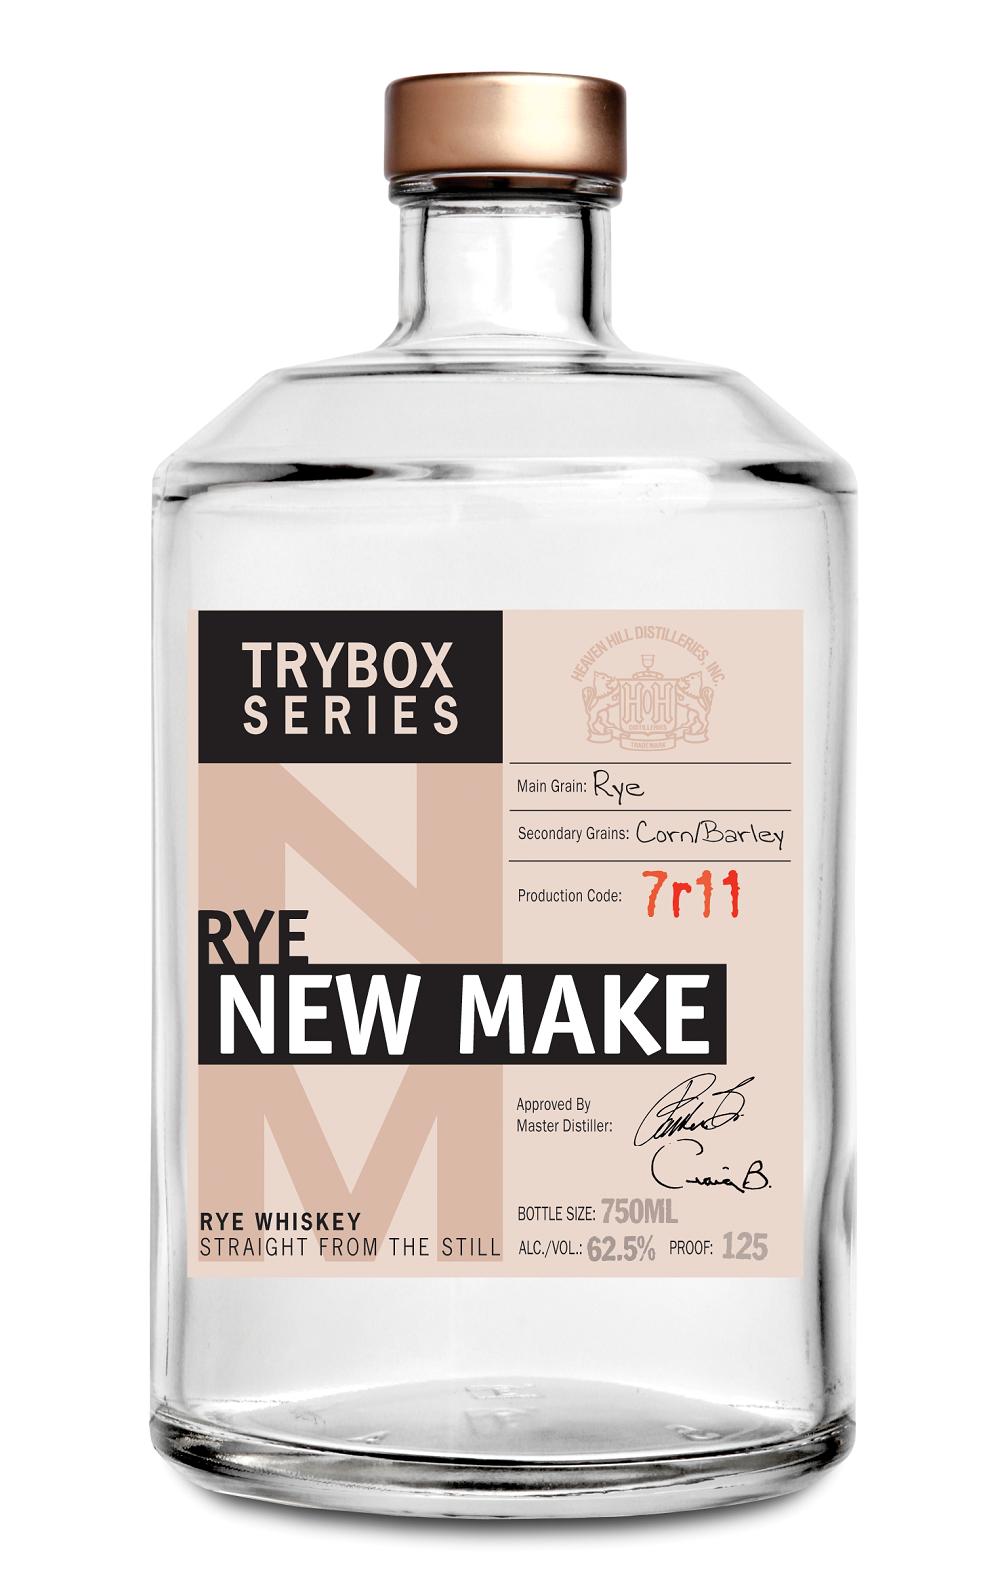 Trybox Series Rye New Make Whiskey